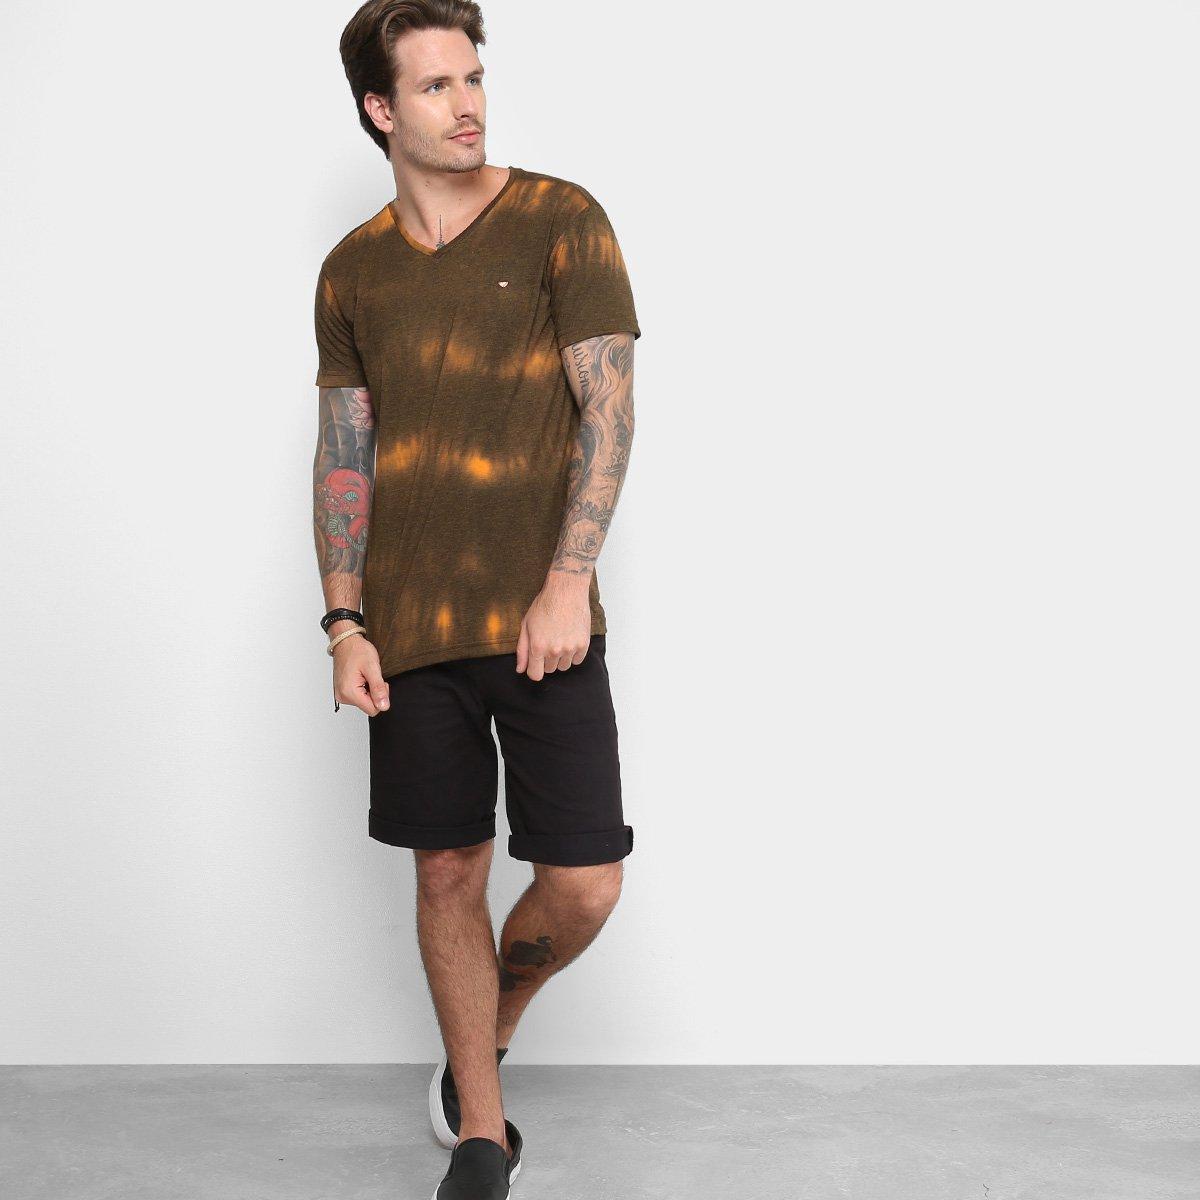 aef993163f Camiseta Gangster Gola V Tie Dye Masculina - Preto e Laranja ...